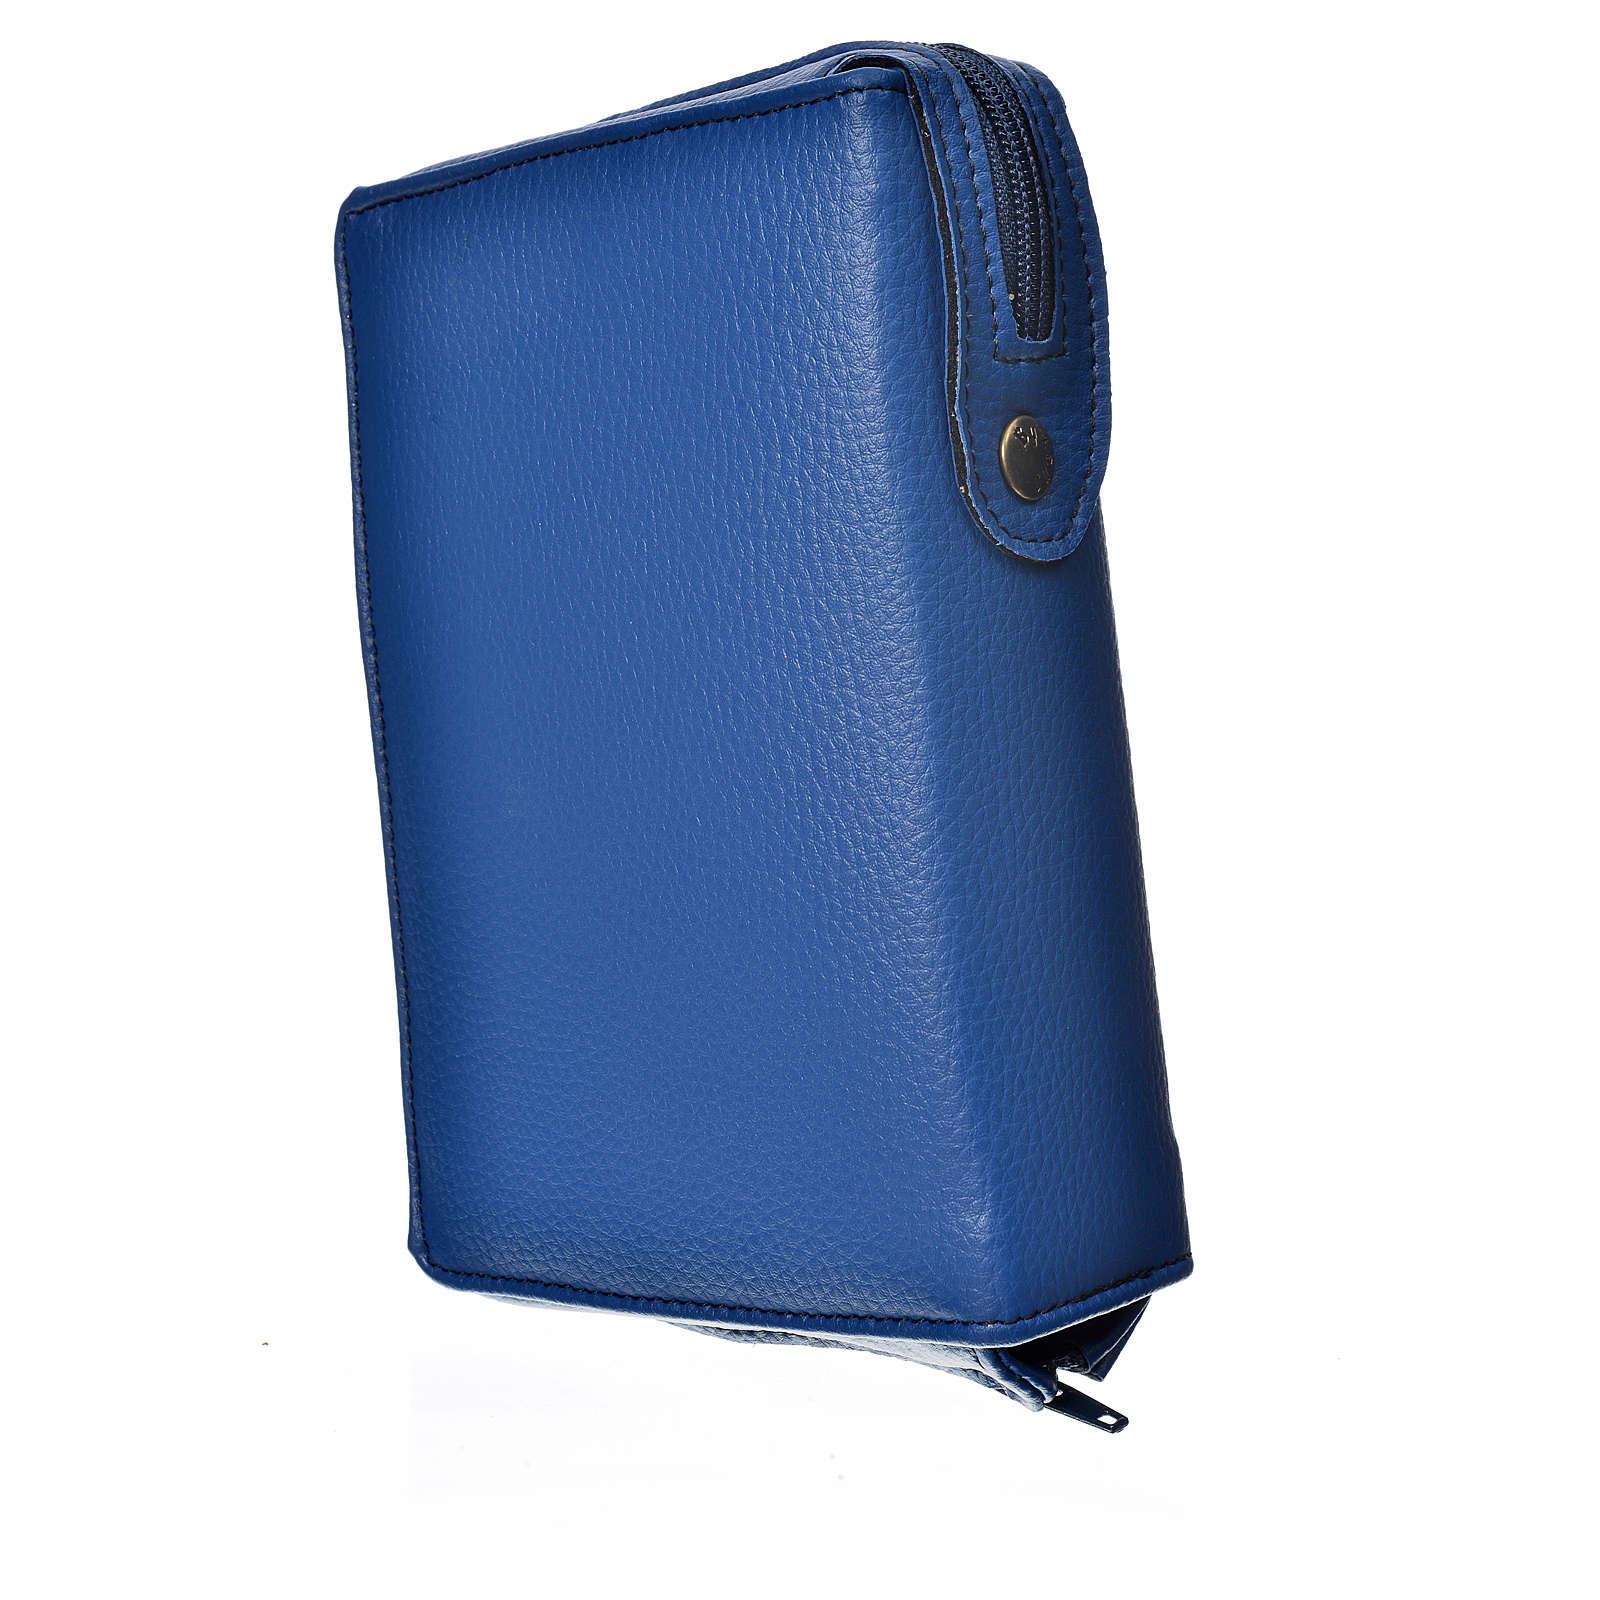 Funda Sagrada Biblia CEE ED. Pop. azul simil cuero Pantocrator 4